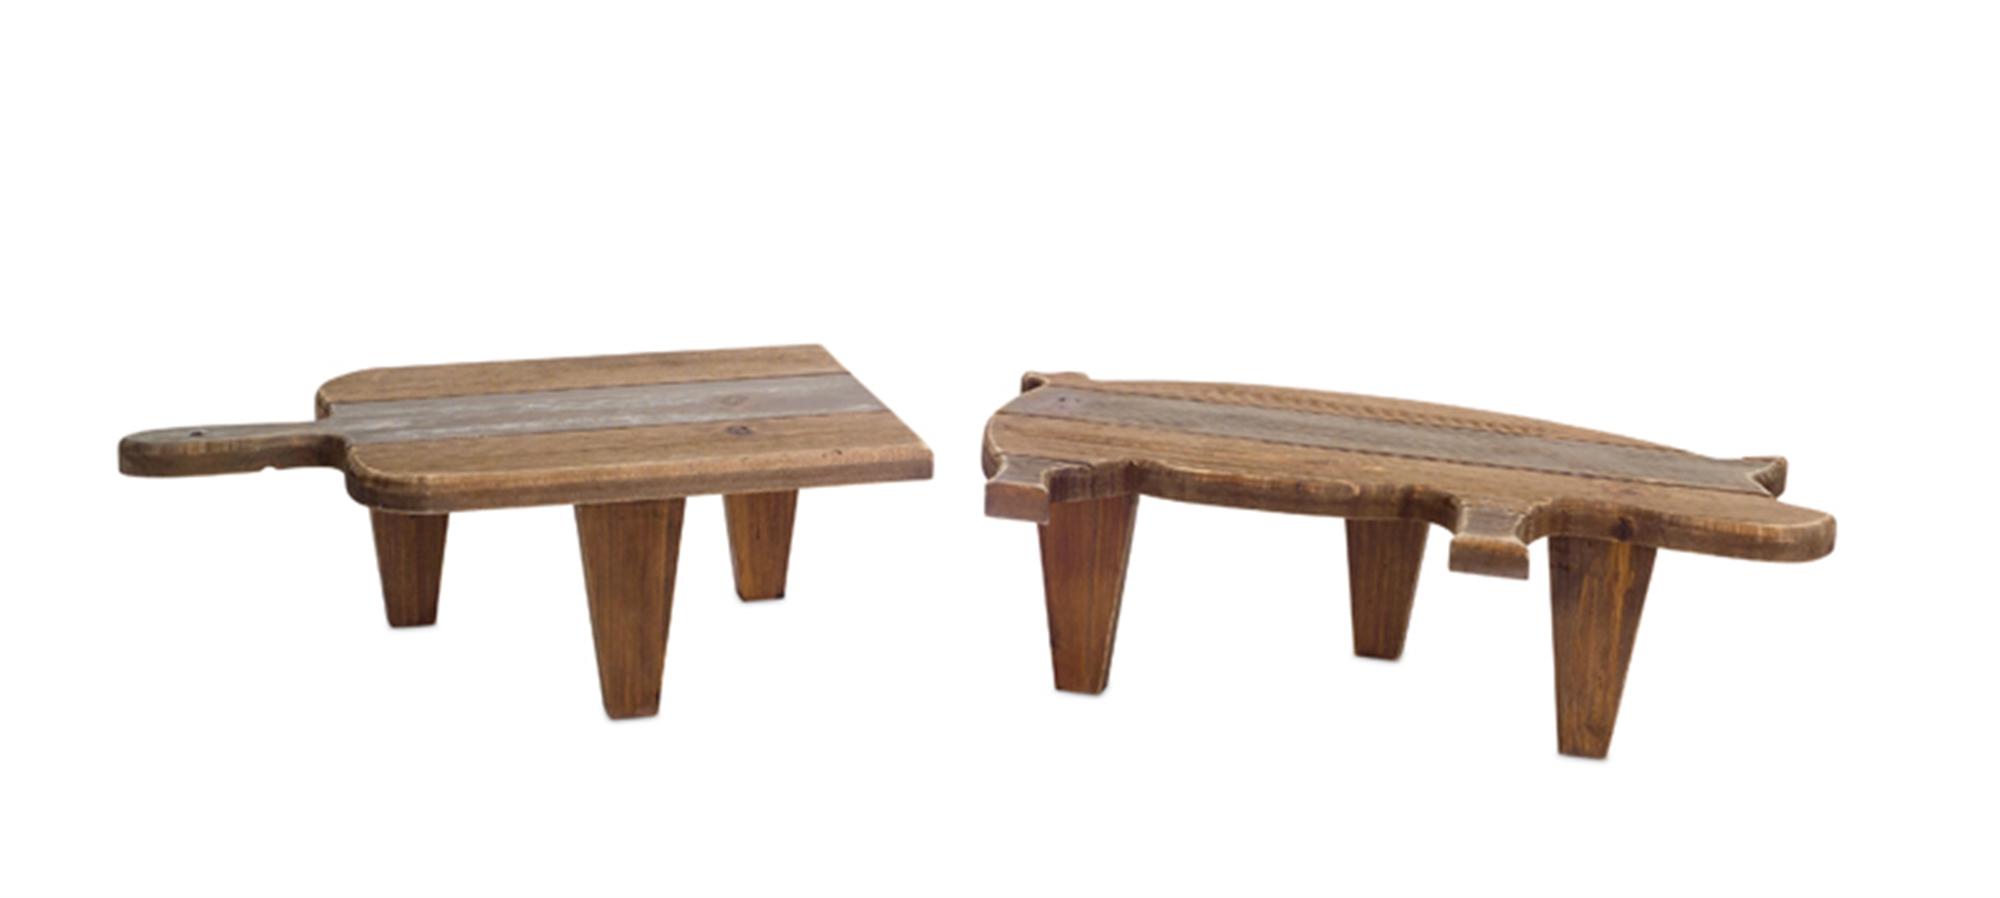 "Pig/Cutting Board Stool (Set of 4) 5""H, 8""H Wood"